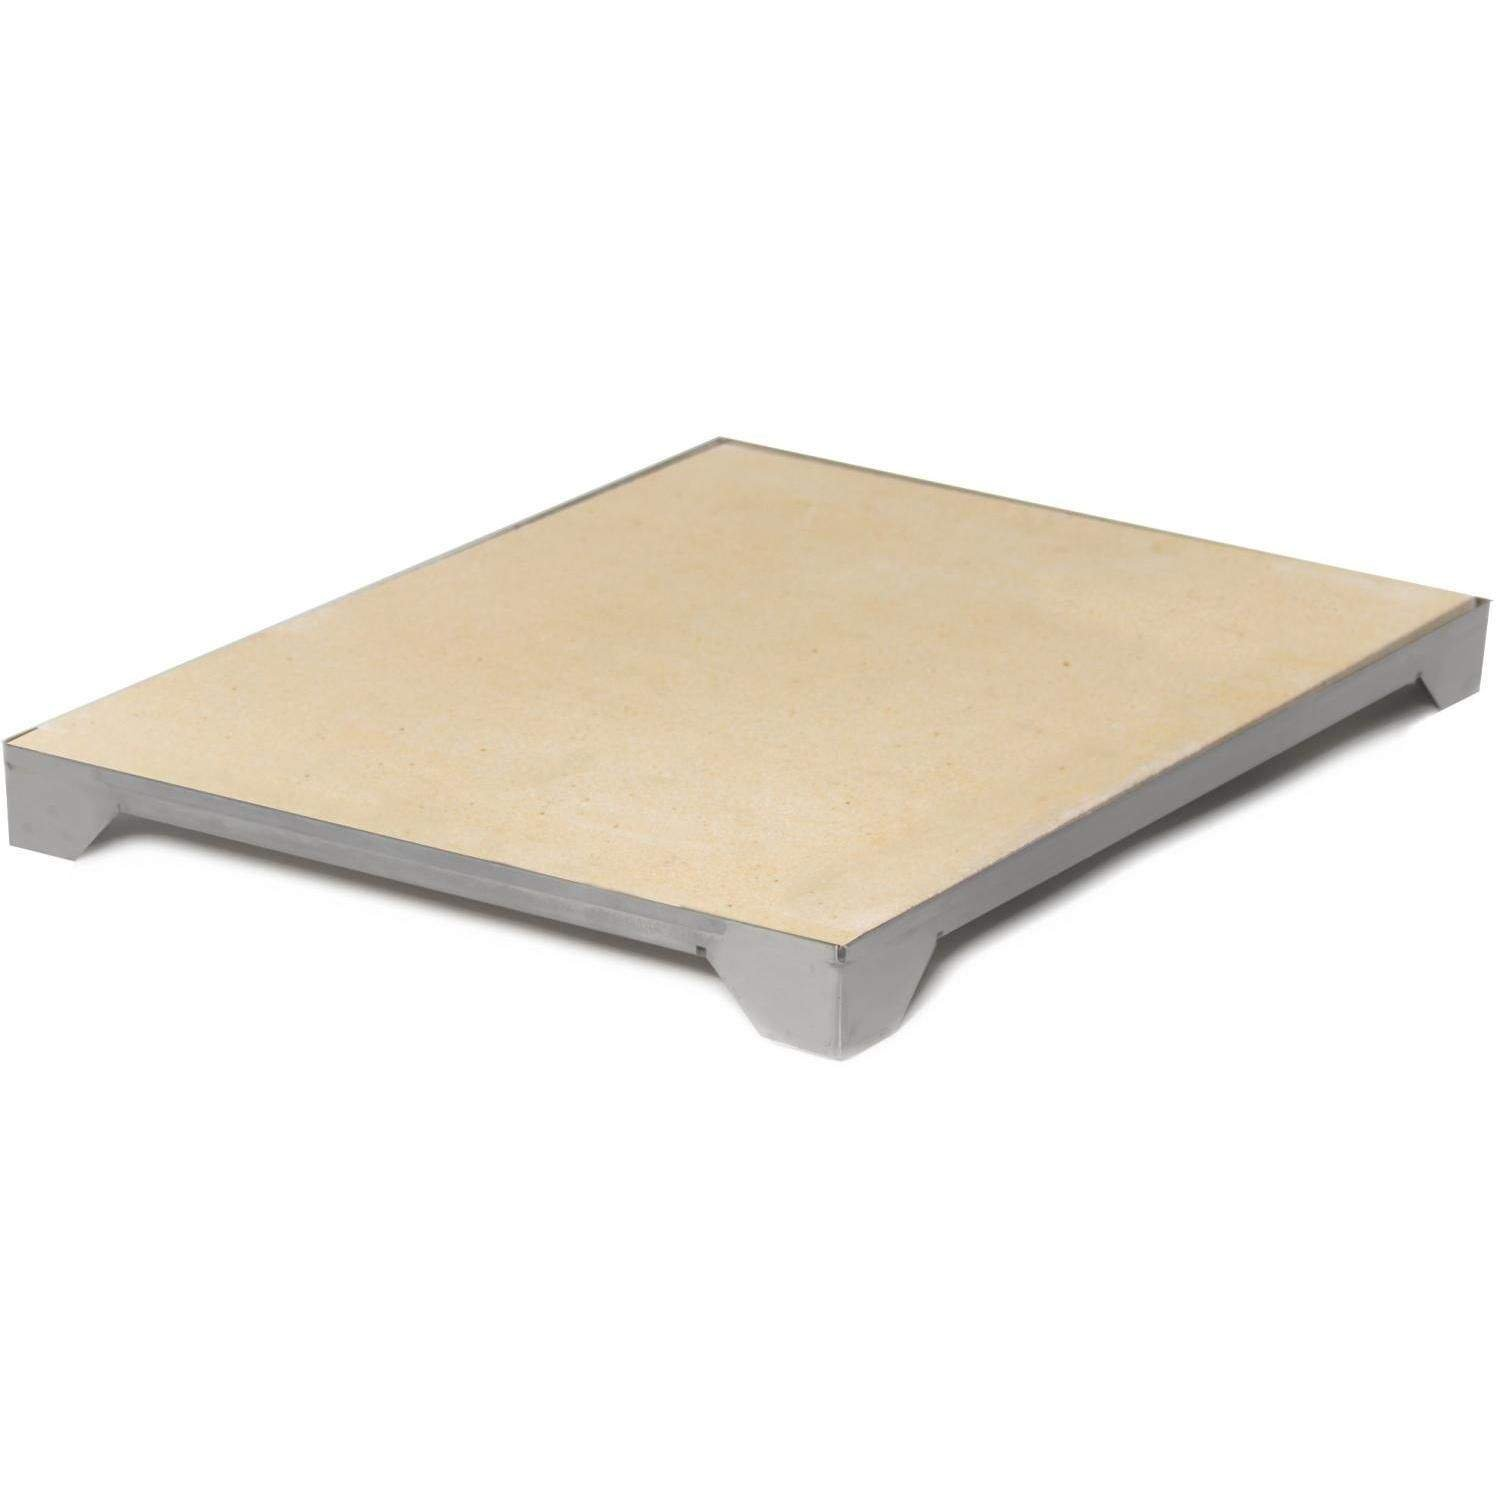 Blaze Professional Ceramic Pizza Stone with Stainless Steel Tray (BLZ-PRO-PZST), 15-inches by Blaze